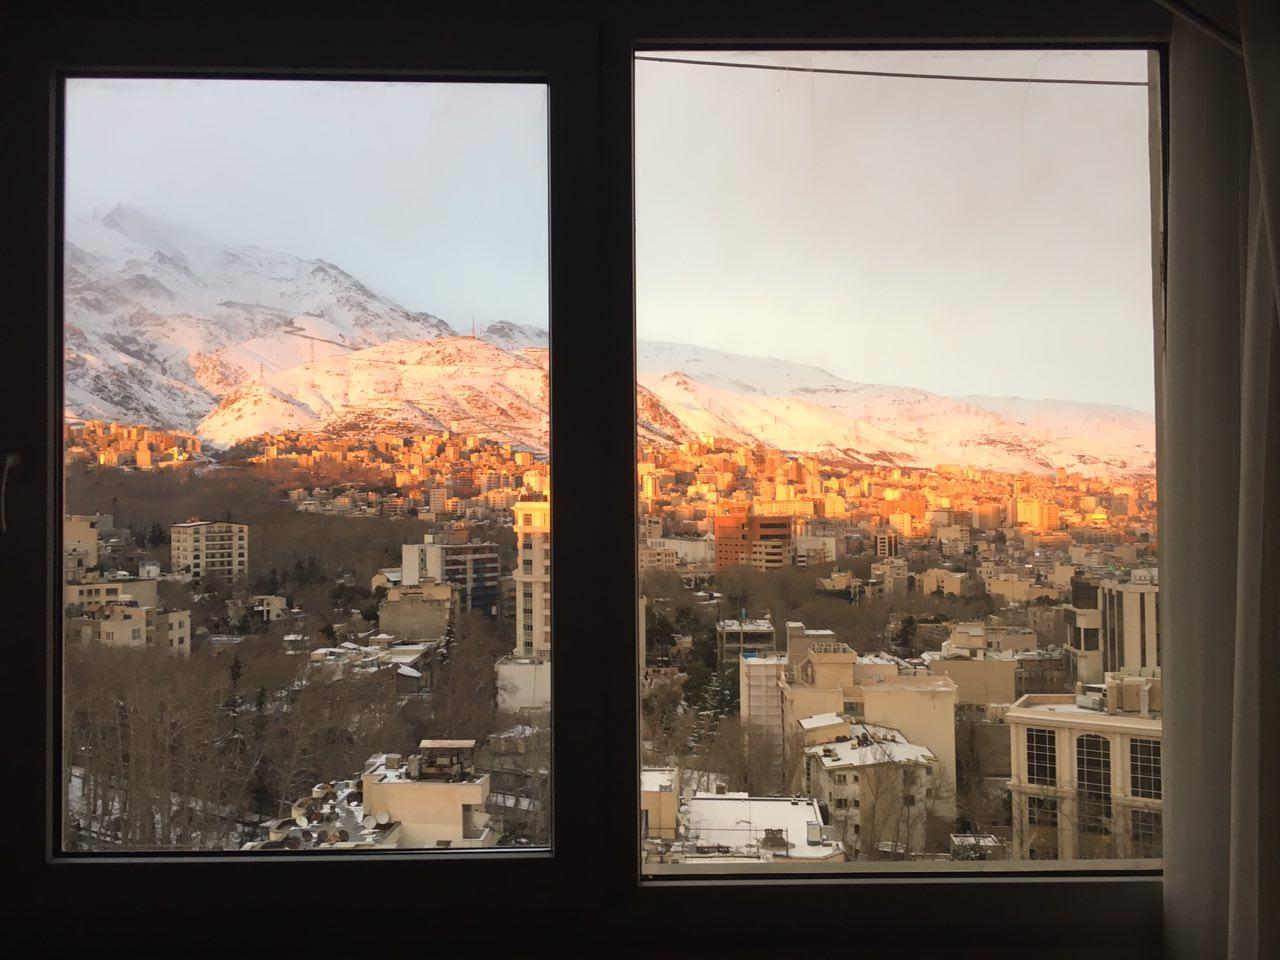 Shaghayegh Cyrous, 11:40 AM __________ ١١:٤٠ صبح February, 14, 2017 __________ ٢٦ بهمن ١٣٩٥ Tehran, Iran __________ تهران، ايران, printed photograph, 2017. Image courtesy of the artist.